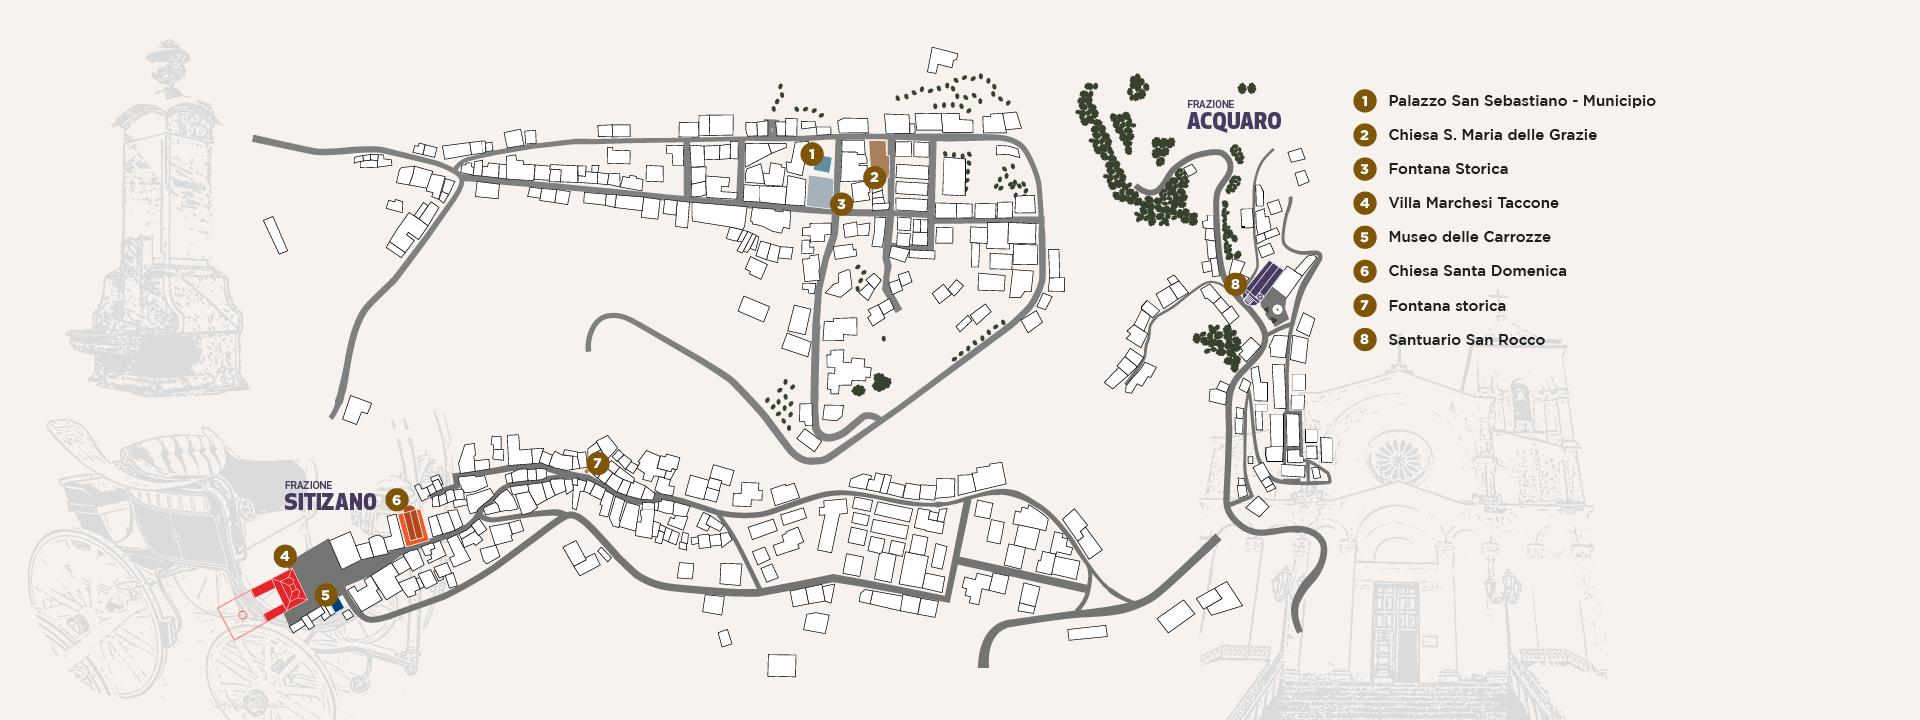 mappa luoghi cosoleto